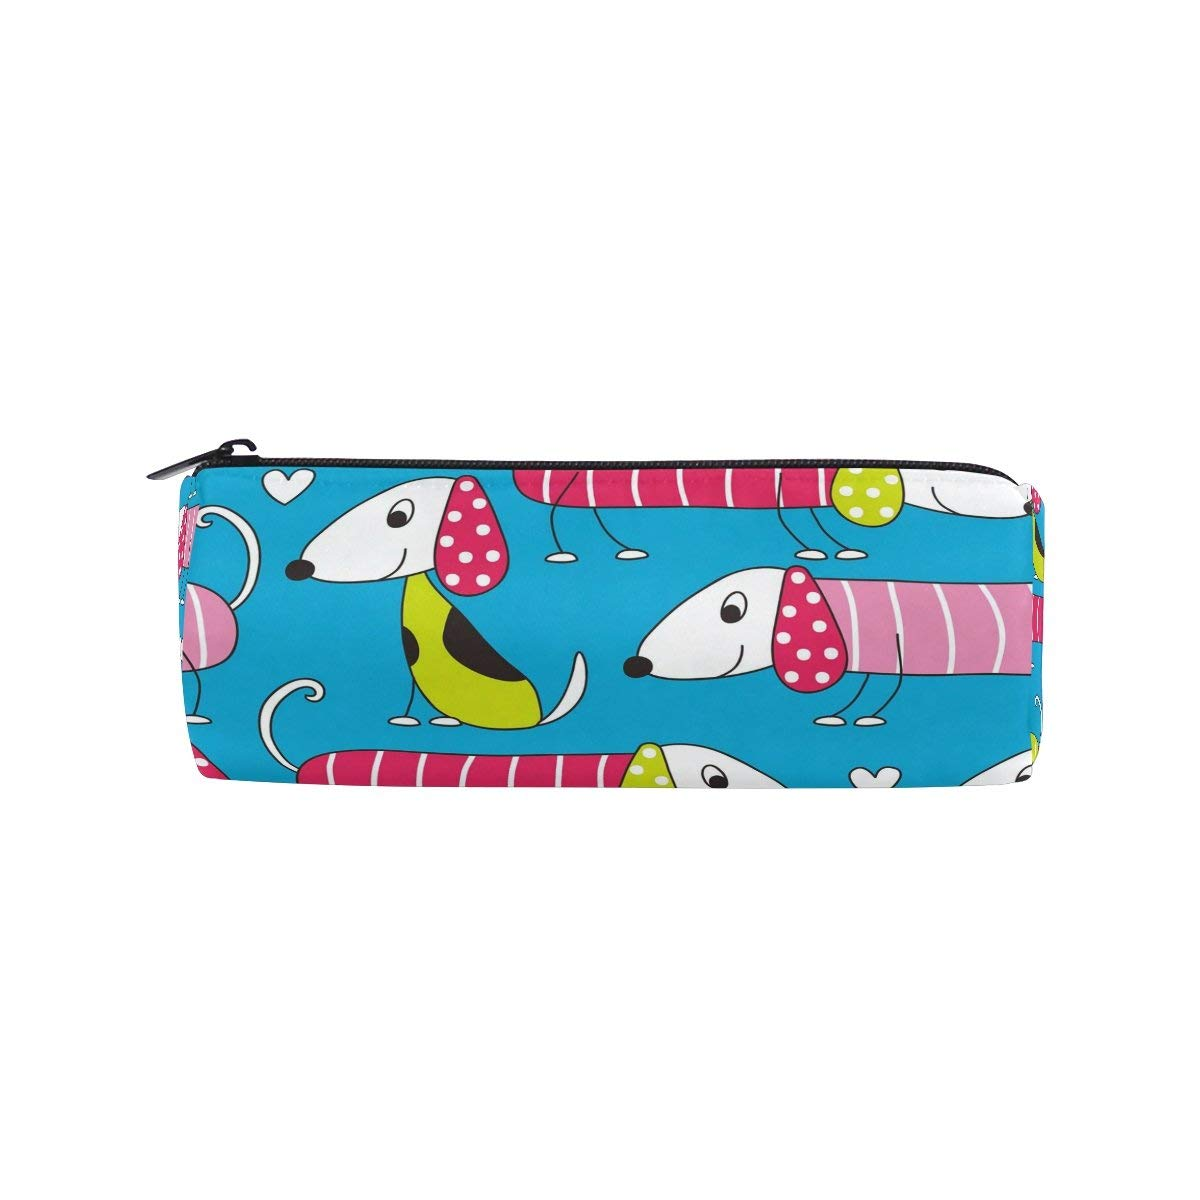 WOZO Colorful Puppy Pug Dog Pen Pencil Case Makeup Cosmetic Pouch Case Travel Bag